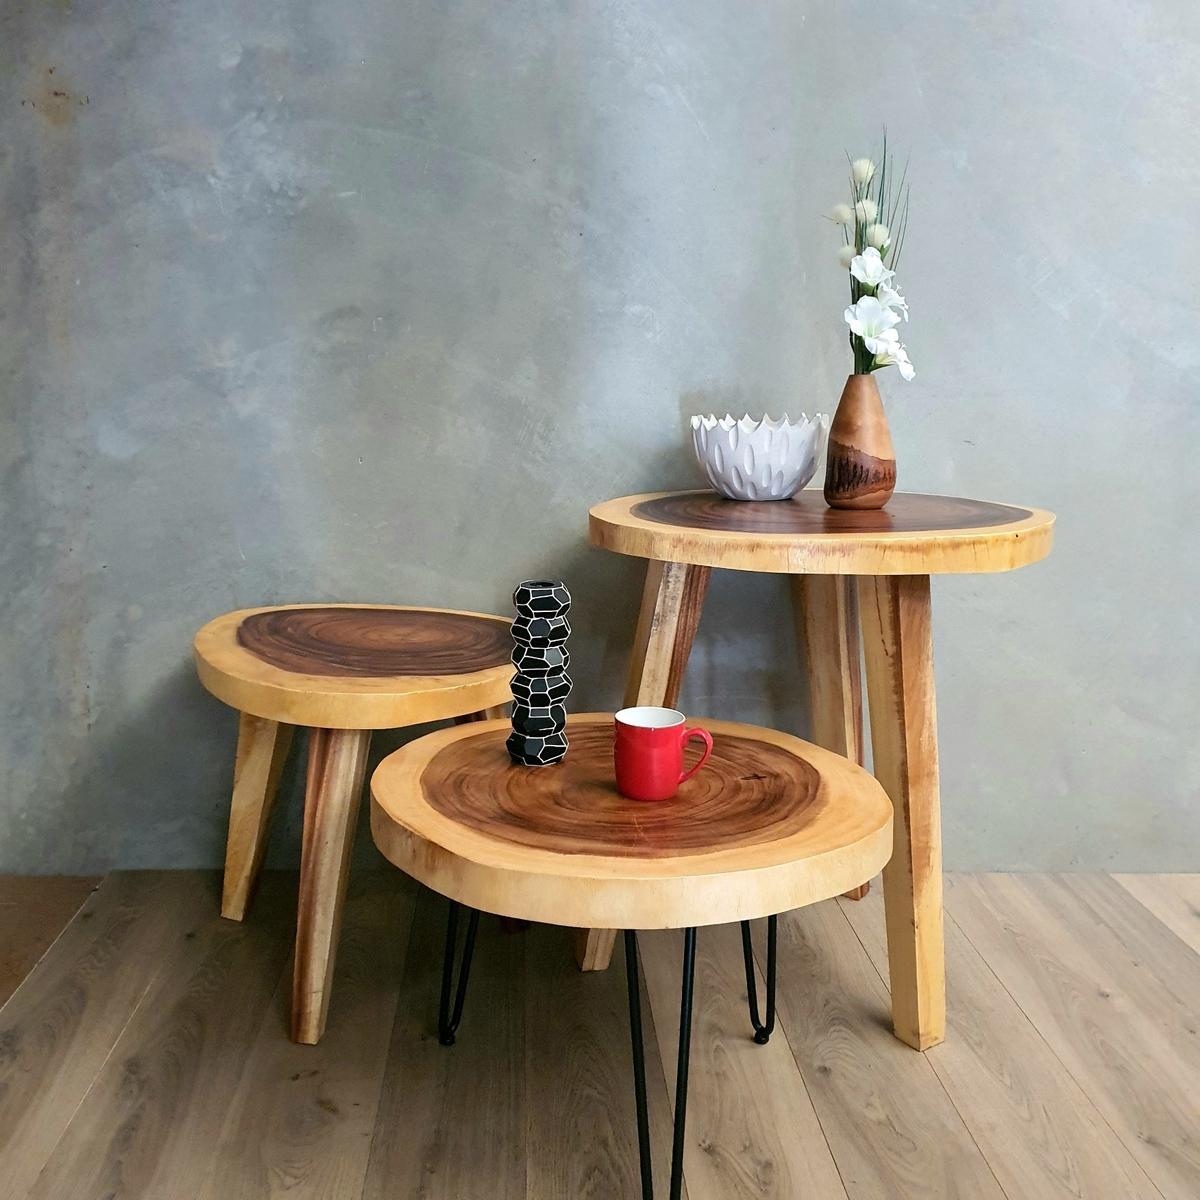 round raintree wood live edge coffee table 65cm diameter 45cm tall